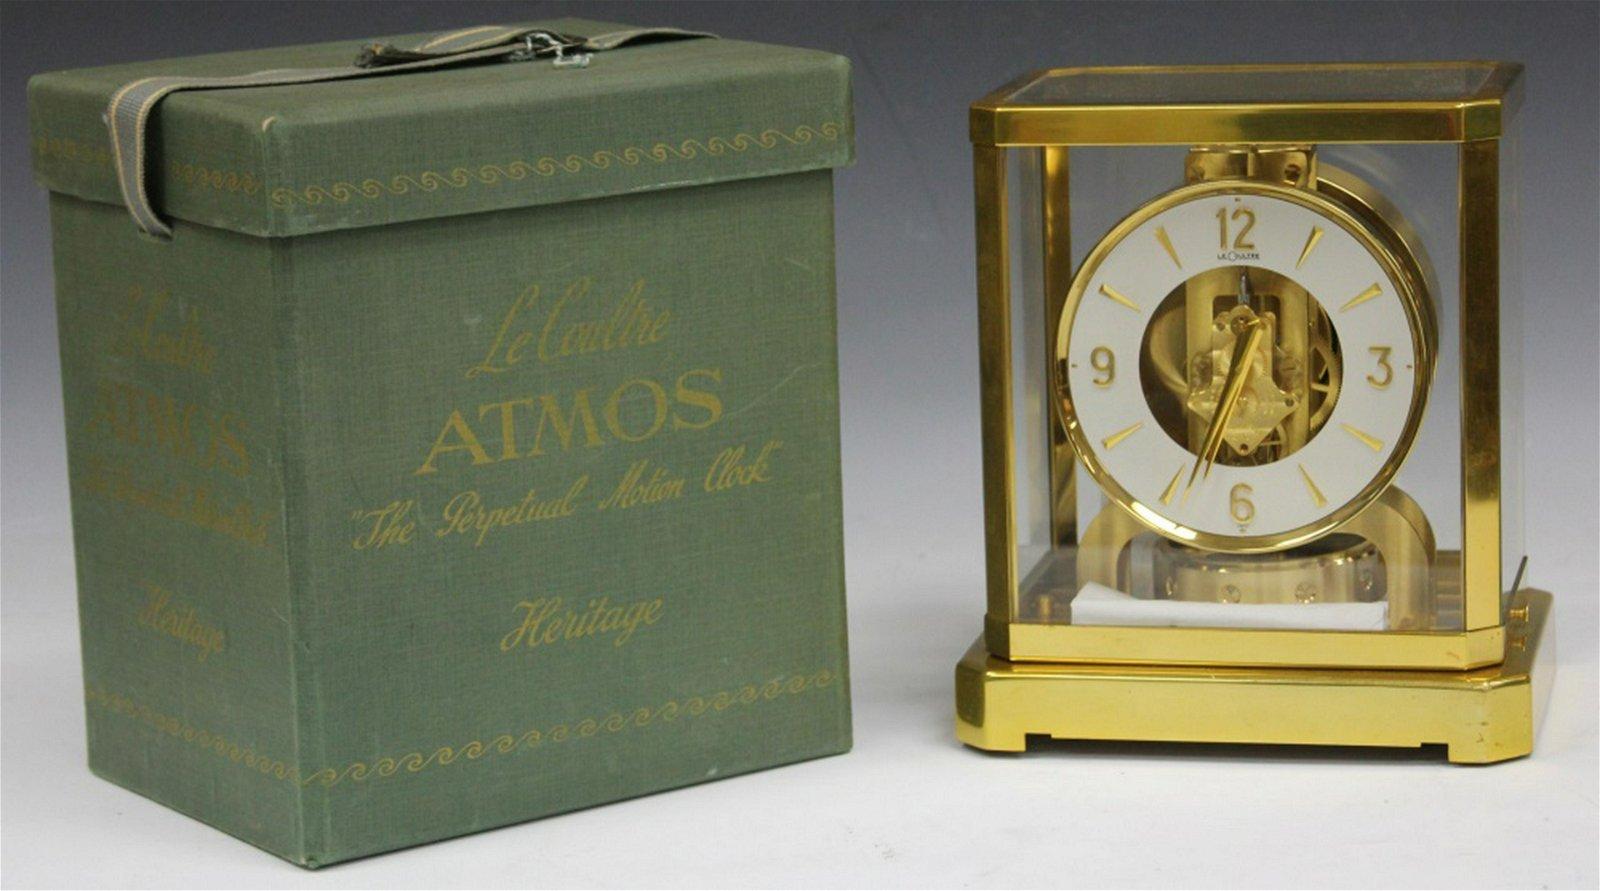 LE COULTRE ATMOS CLOCK W/ ORIGINAL CASE